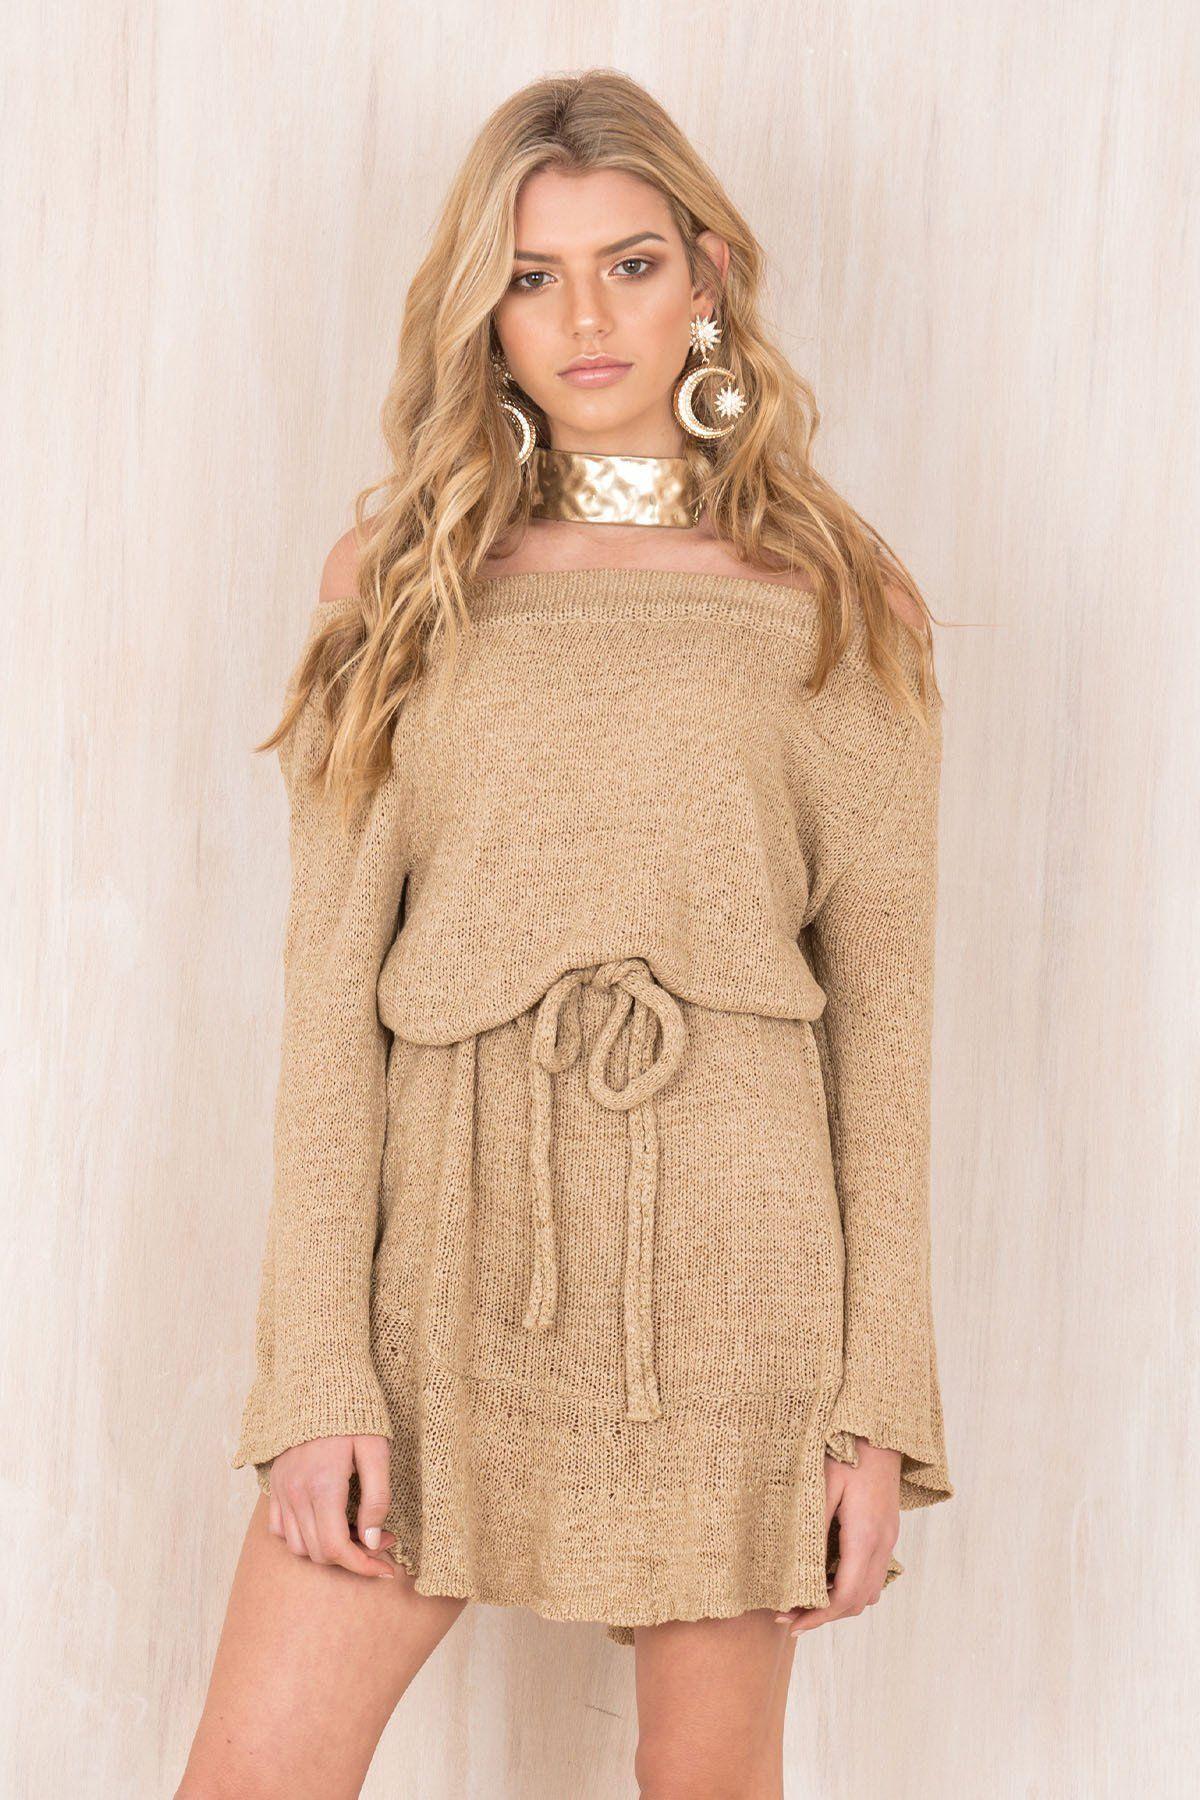 2018 Winter explosion thicken sexy word shoulder sweater dress skirt skirt